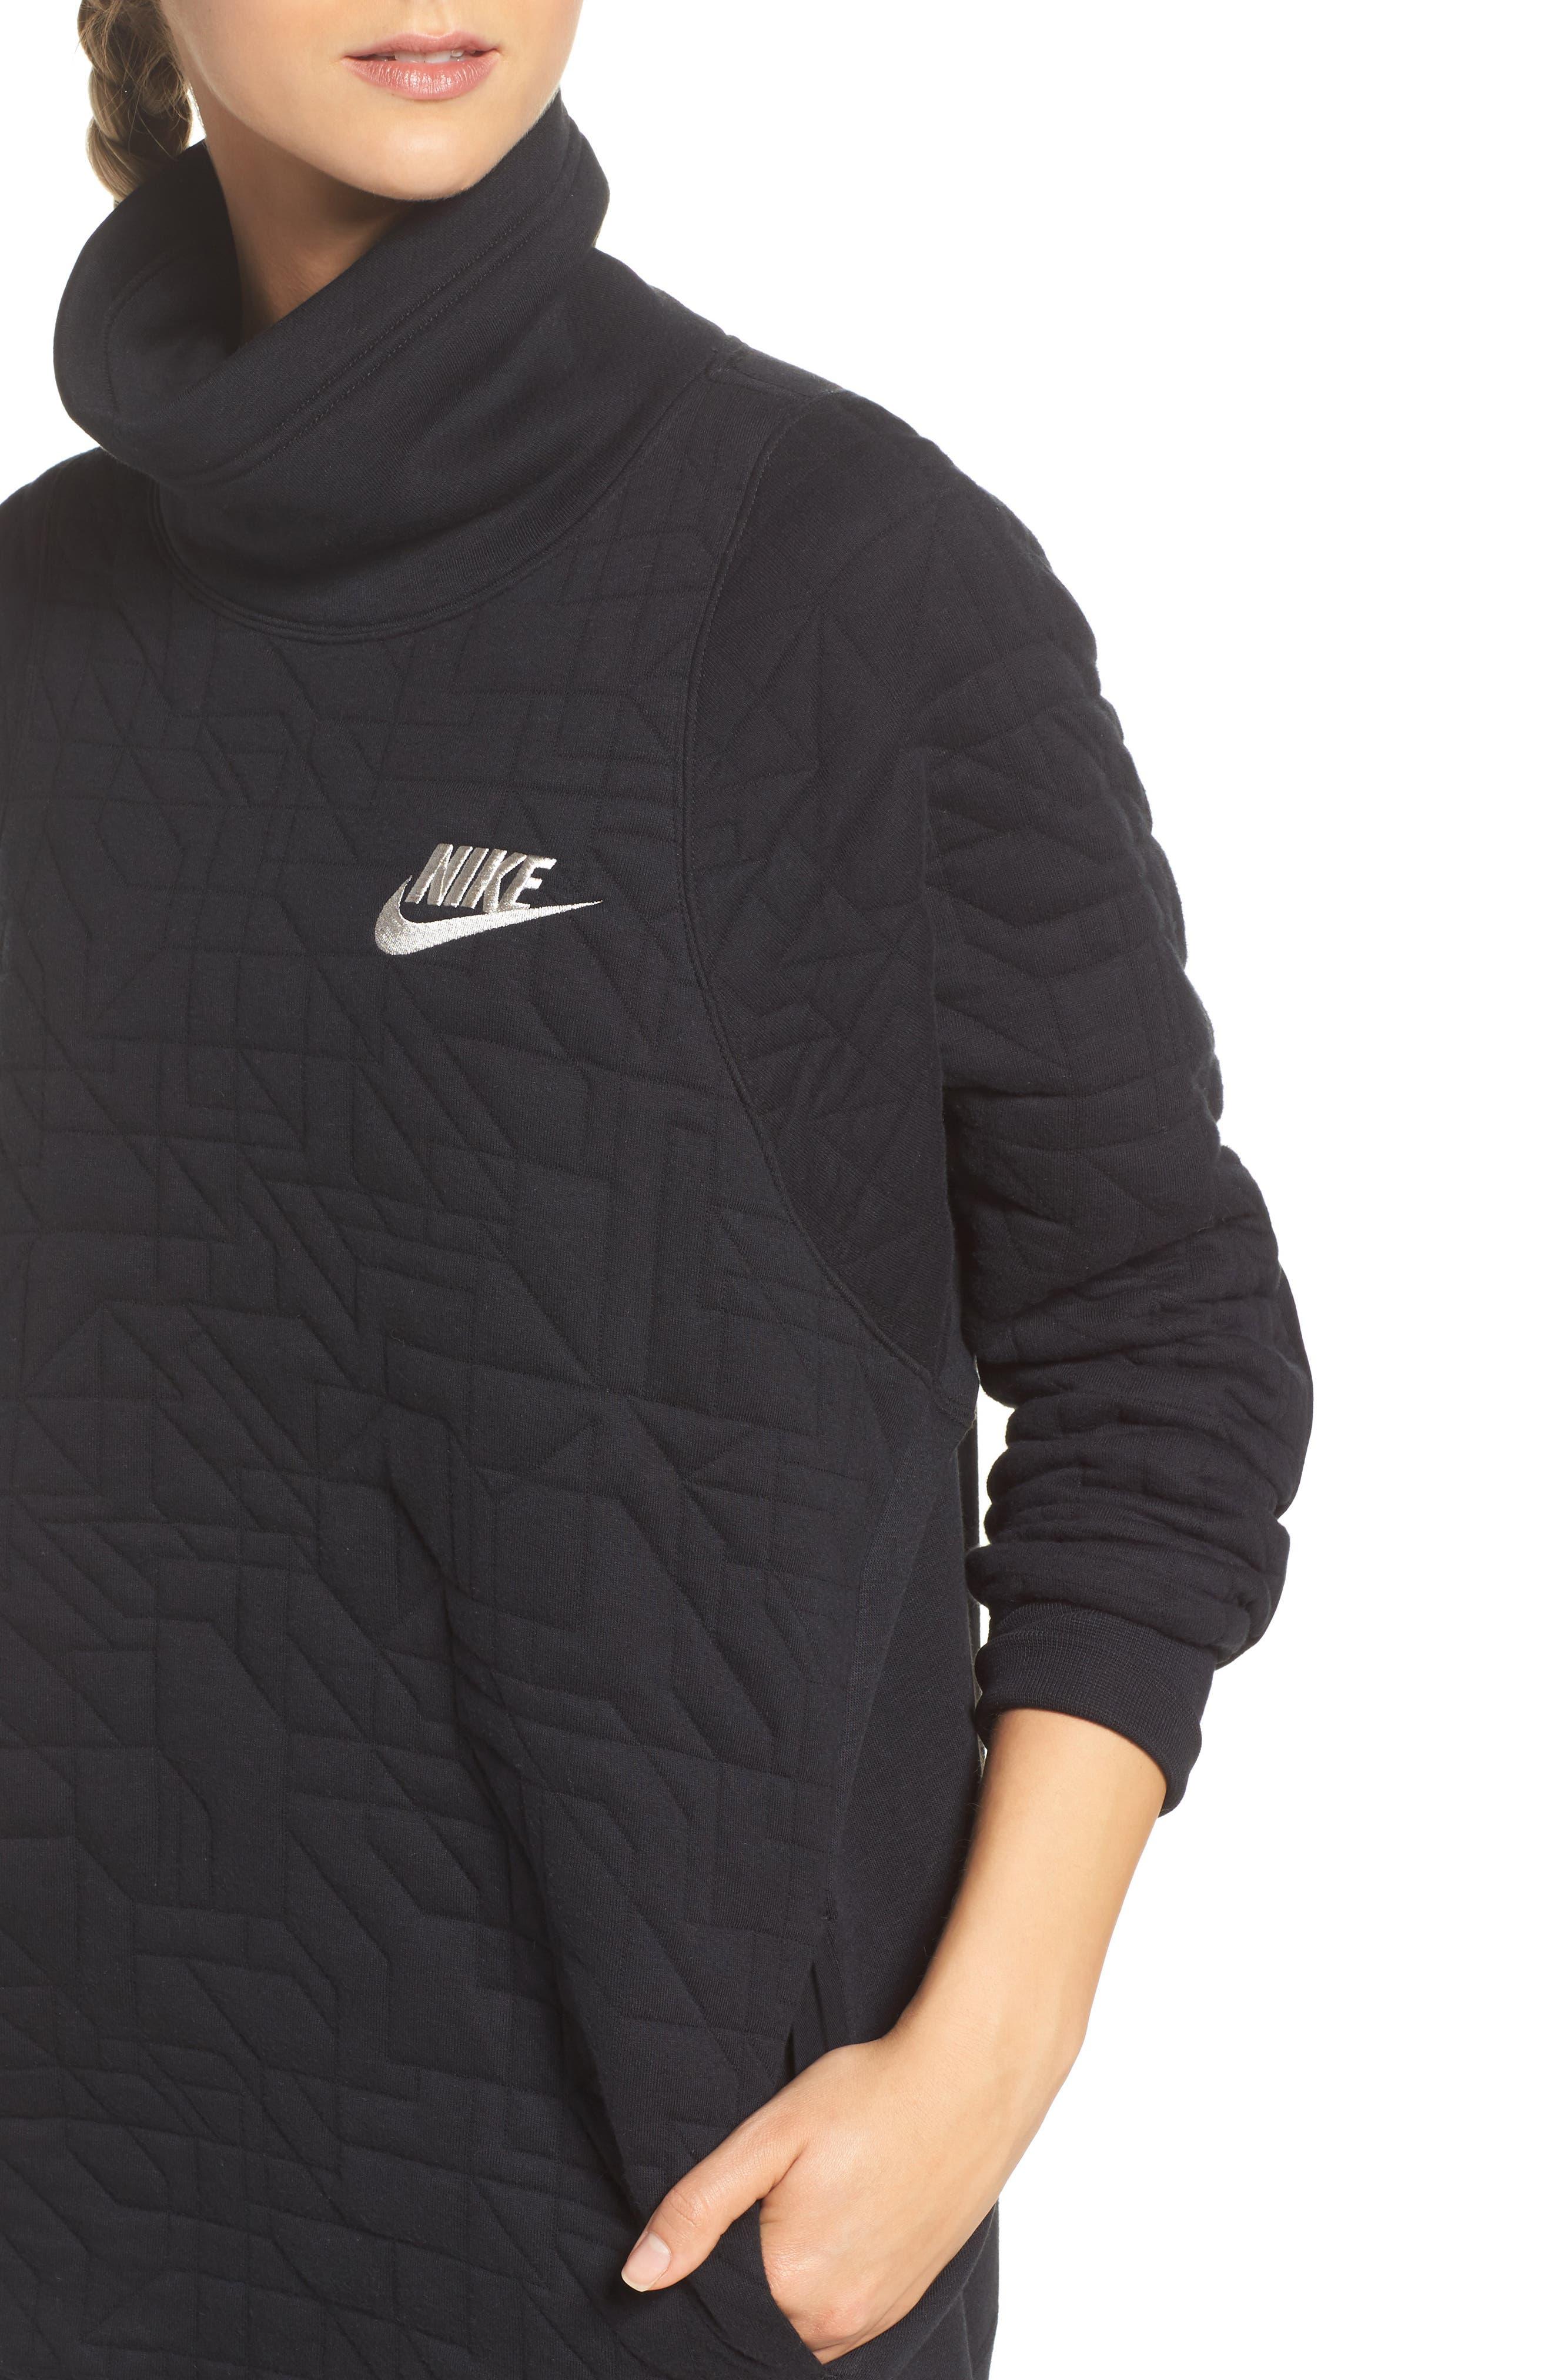 Sportswear Quilted Funnel Neck Pullover,                             Alternate thumbnail 4, color,                             Black/ Light Bone